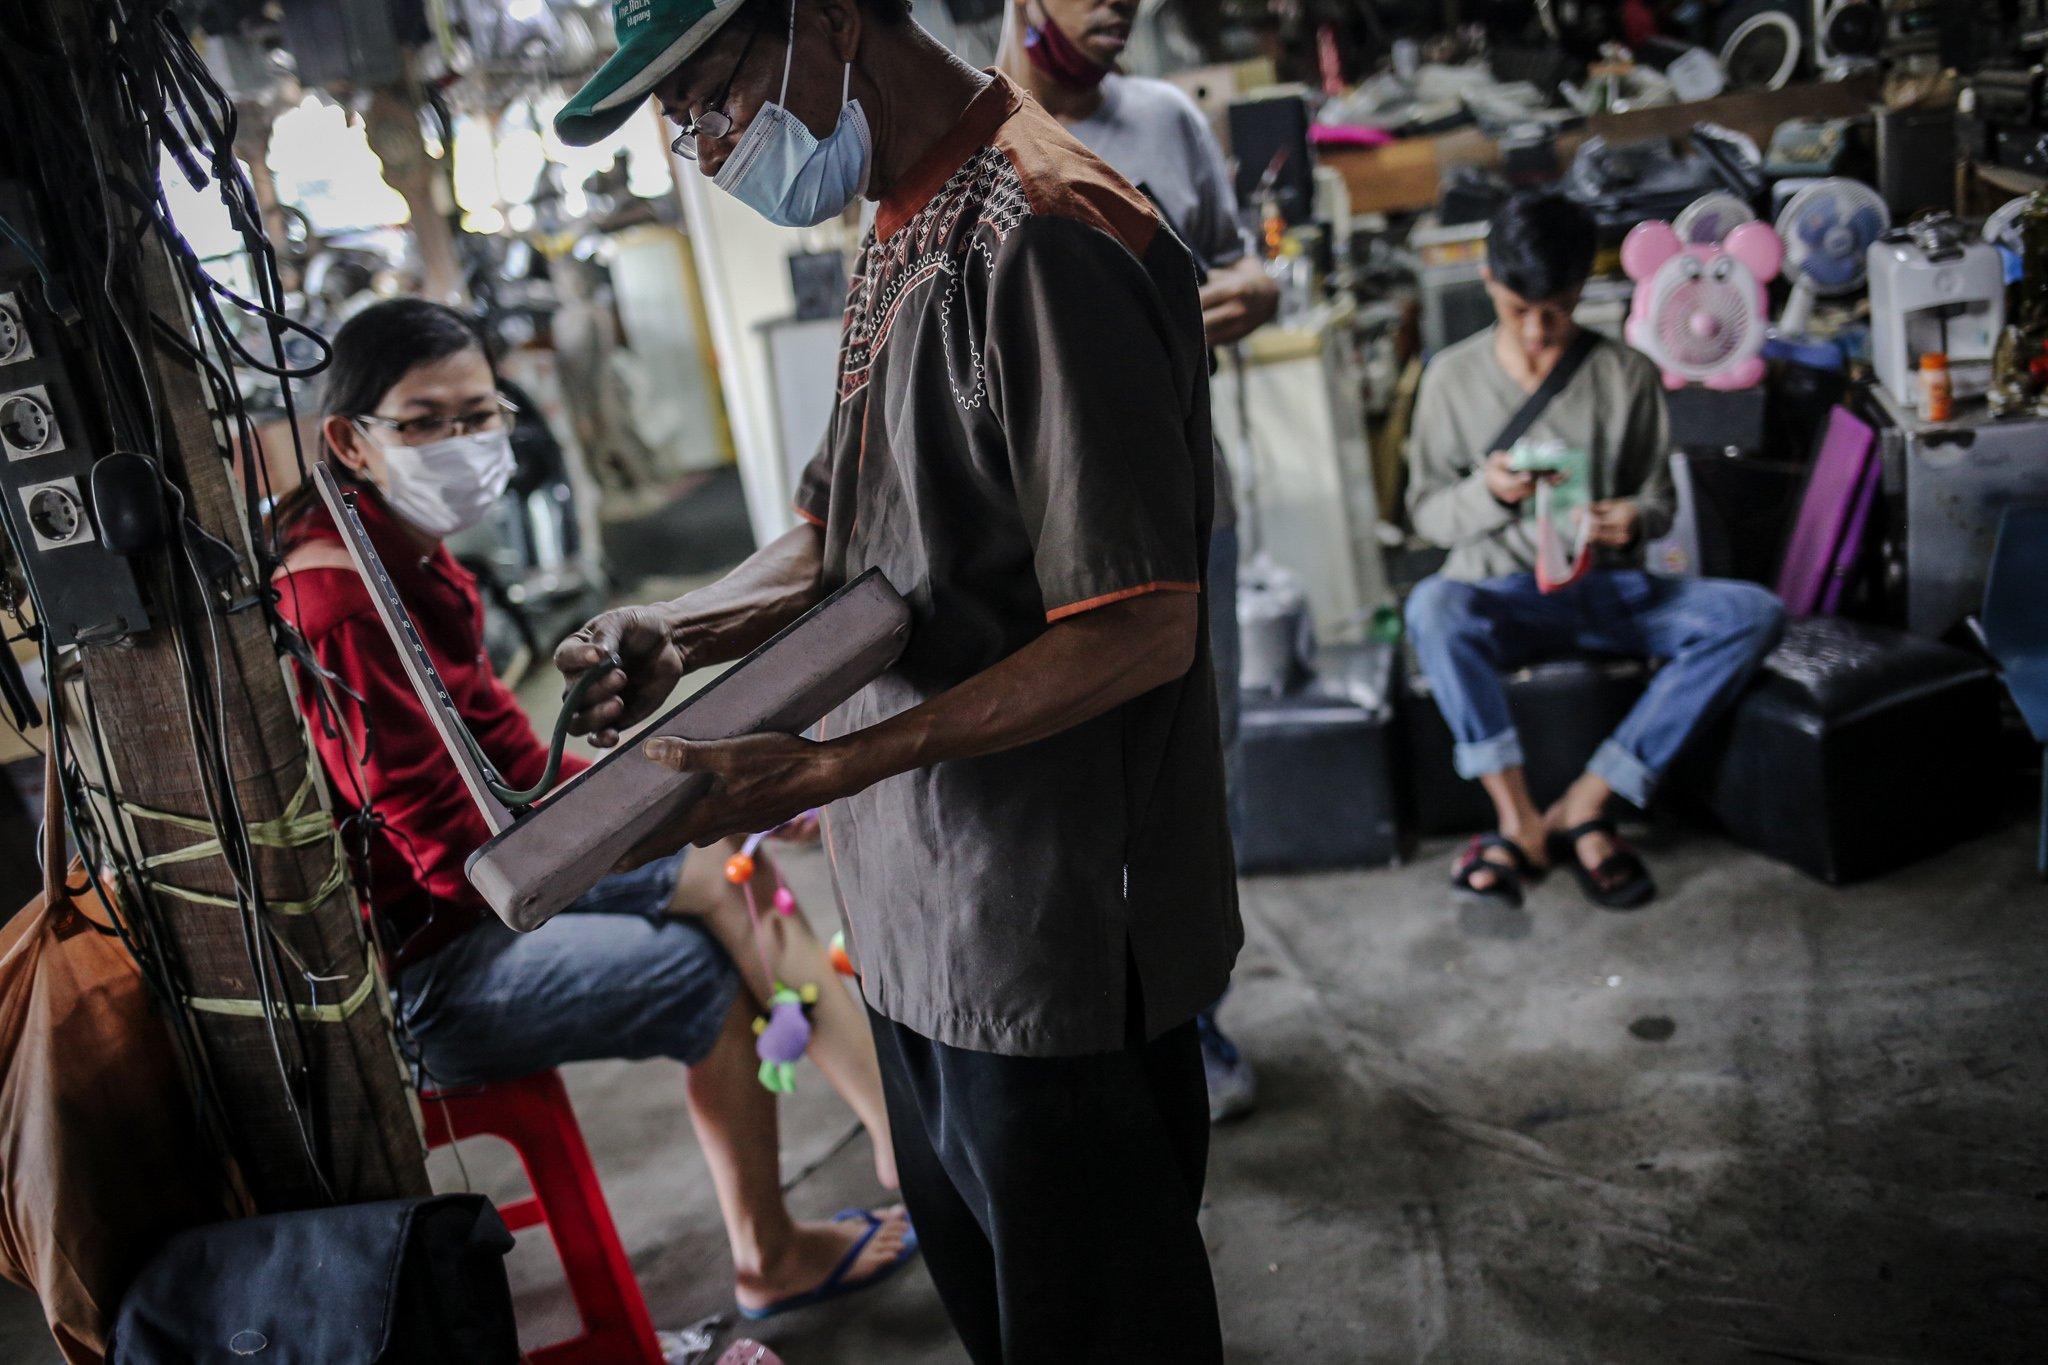 Pengunjung memilah barang bekas yang digantungkan di Mal Rongsok Beji, Depok, Jawa Barat, Jumat, (17/9/2021). Pengunjug yang datang ke Mal Rongsok tersebut tak hanya datang dari wilayah sekitar, namun hingga ke luar pulau, bahkan negara lain seperti Australia dan Jepang, untuk sekedar mencari barang-barang unik.